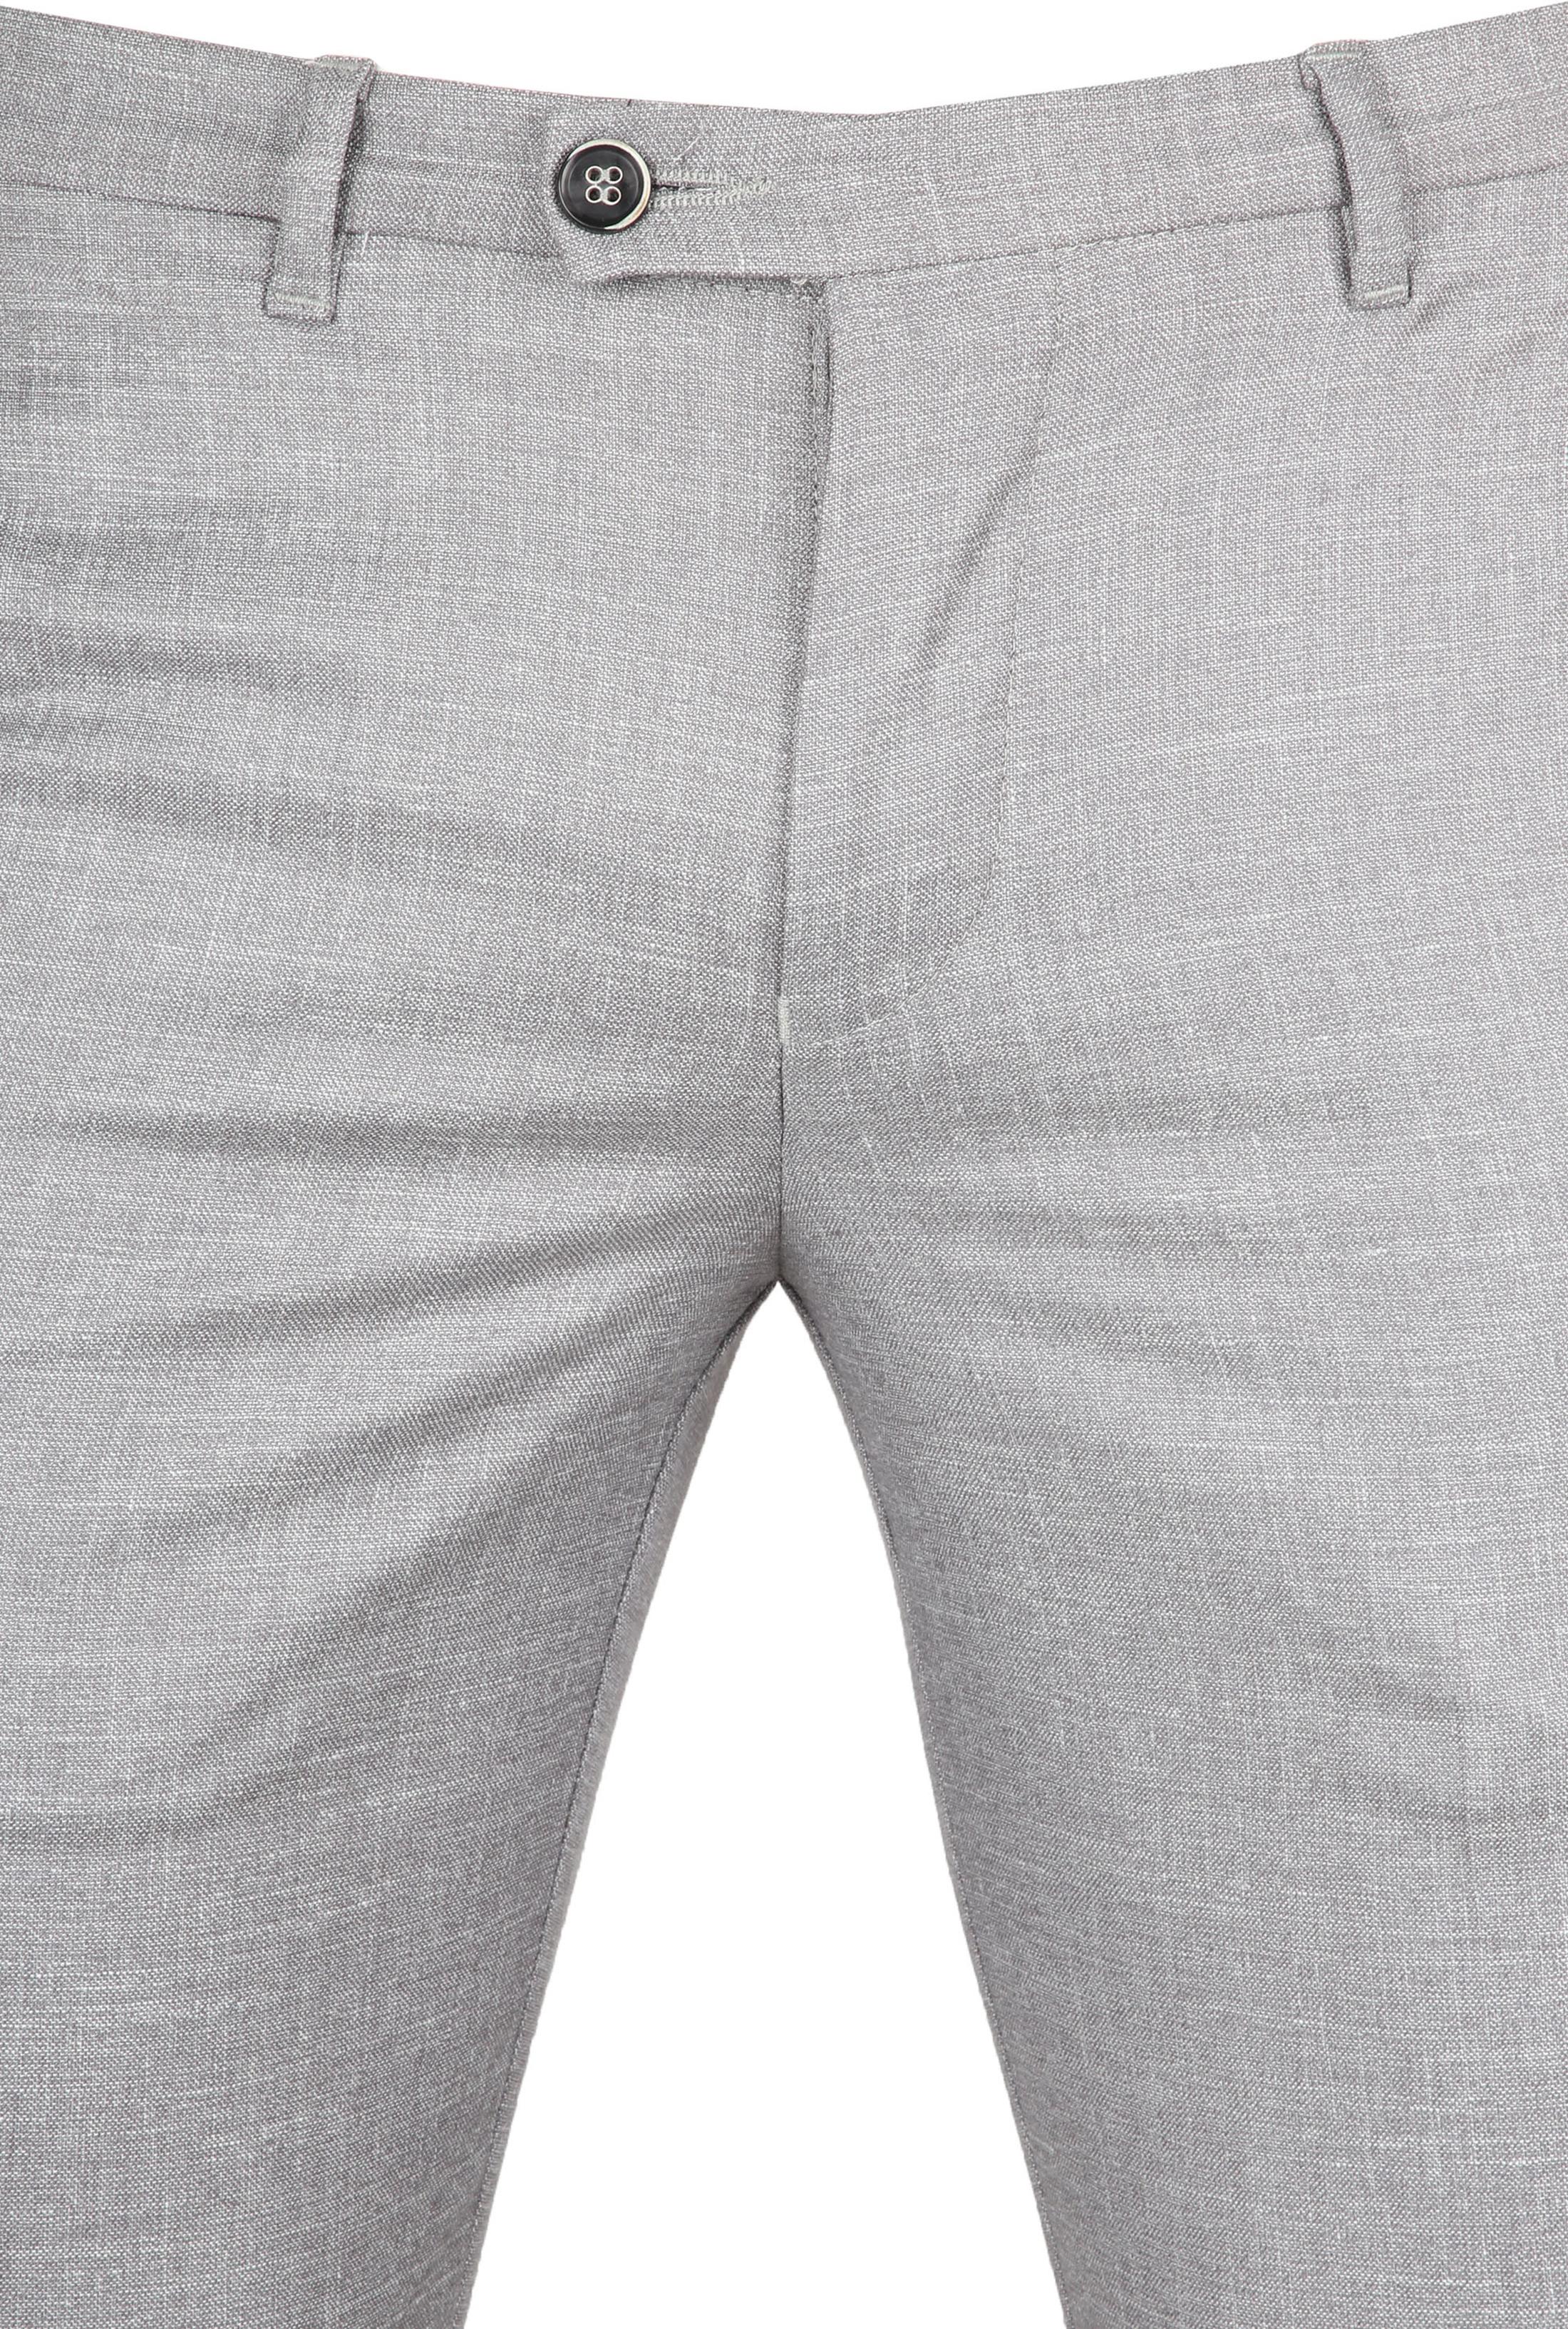 Suitable Pantalon Pisa Melange Grau foto 2